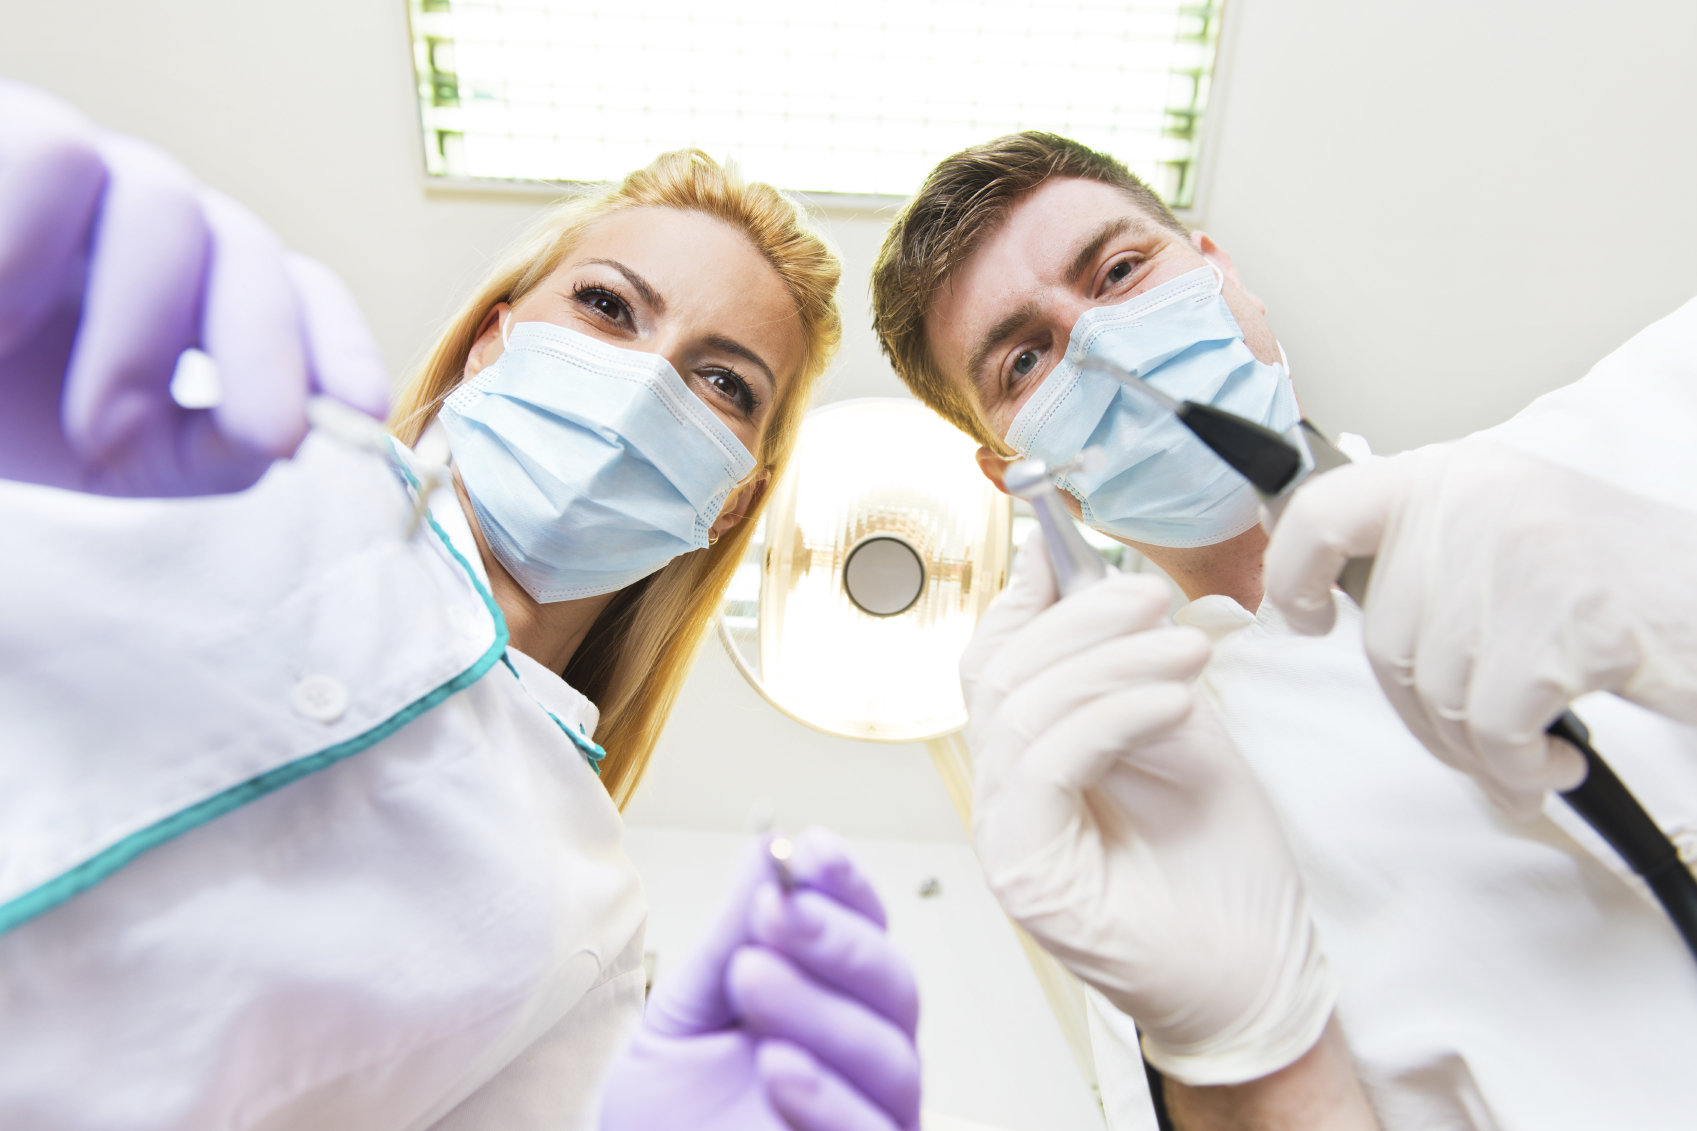 dentist bruxism